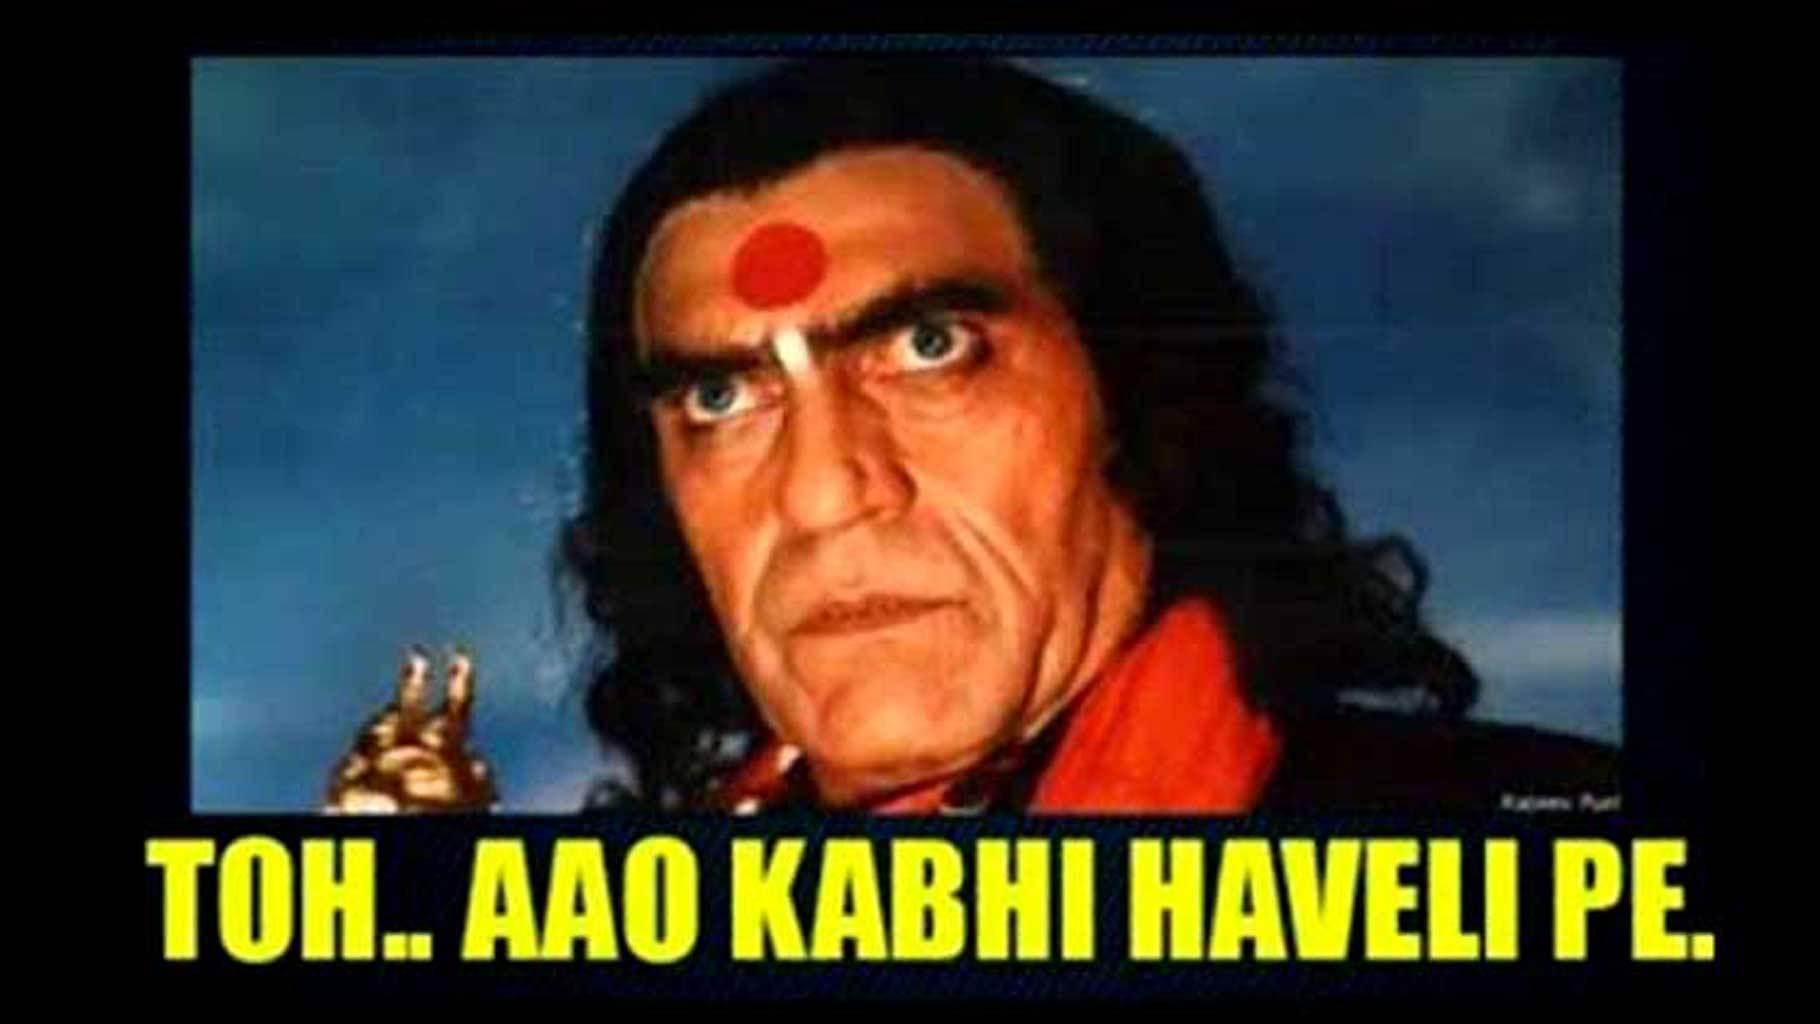 How 'Aao kabhi haveli pe' immortalises Amrish Puri